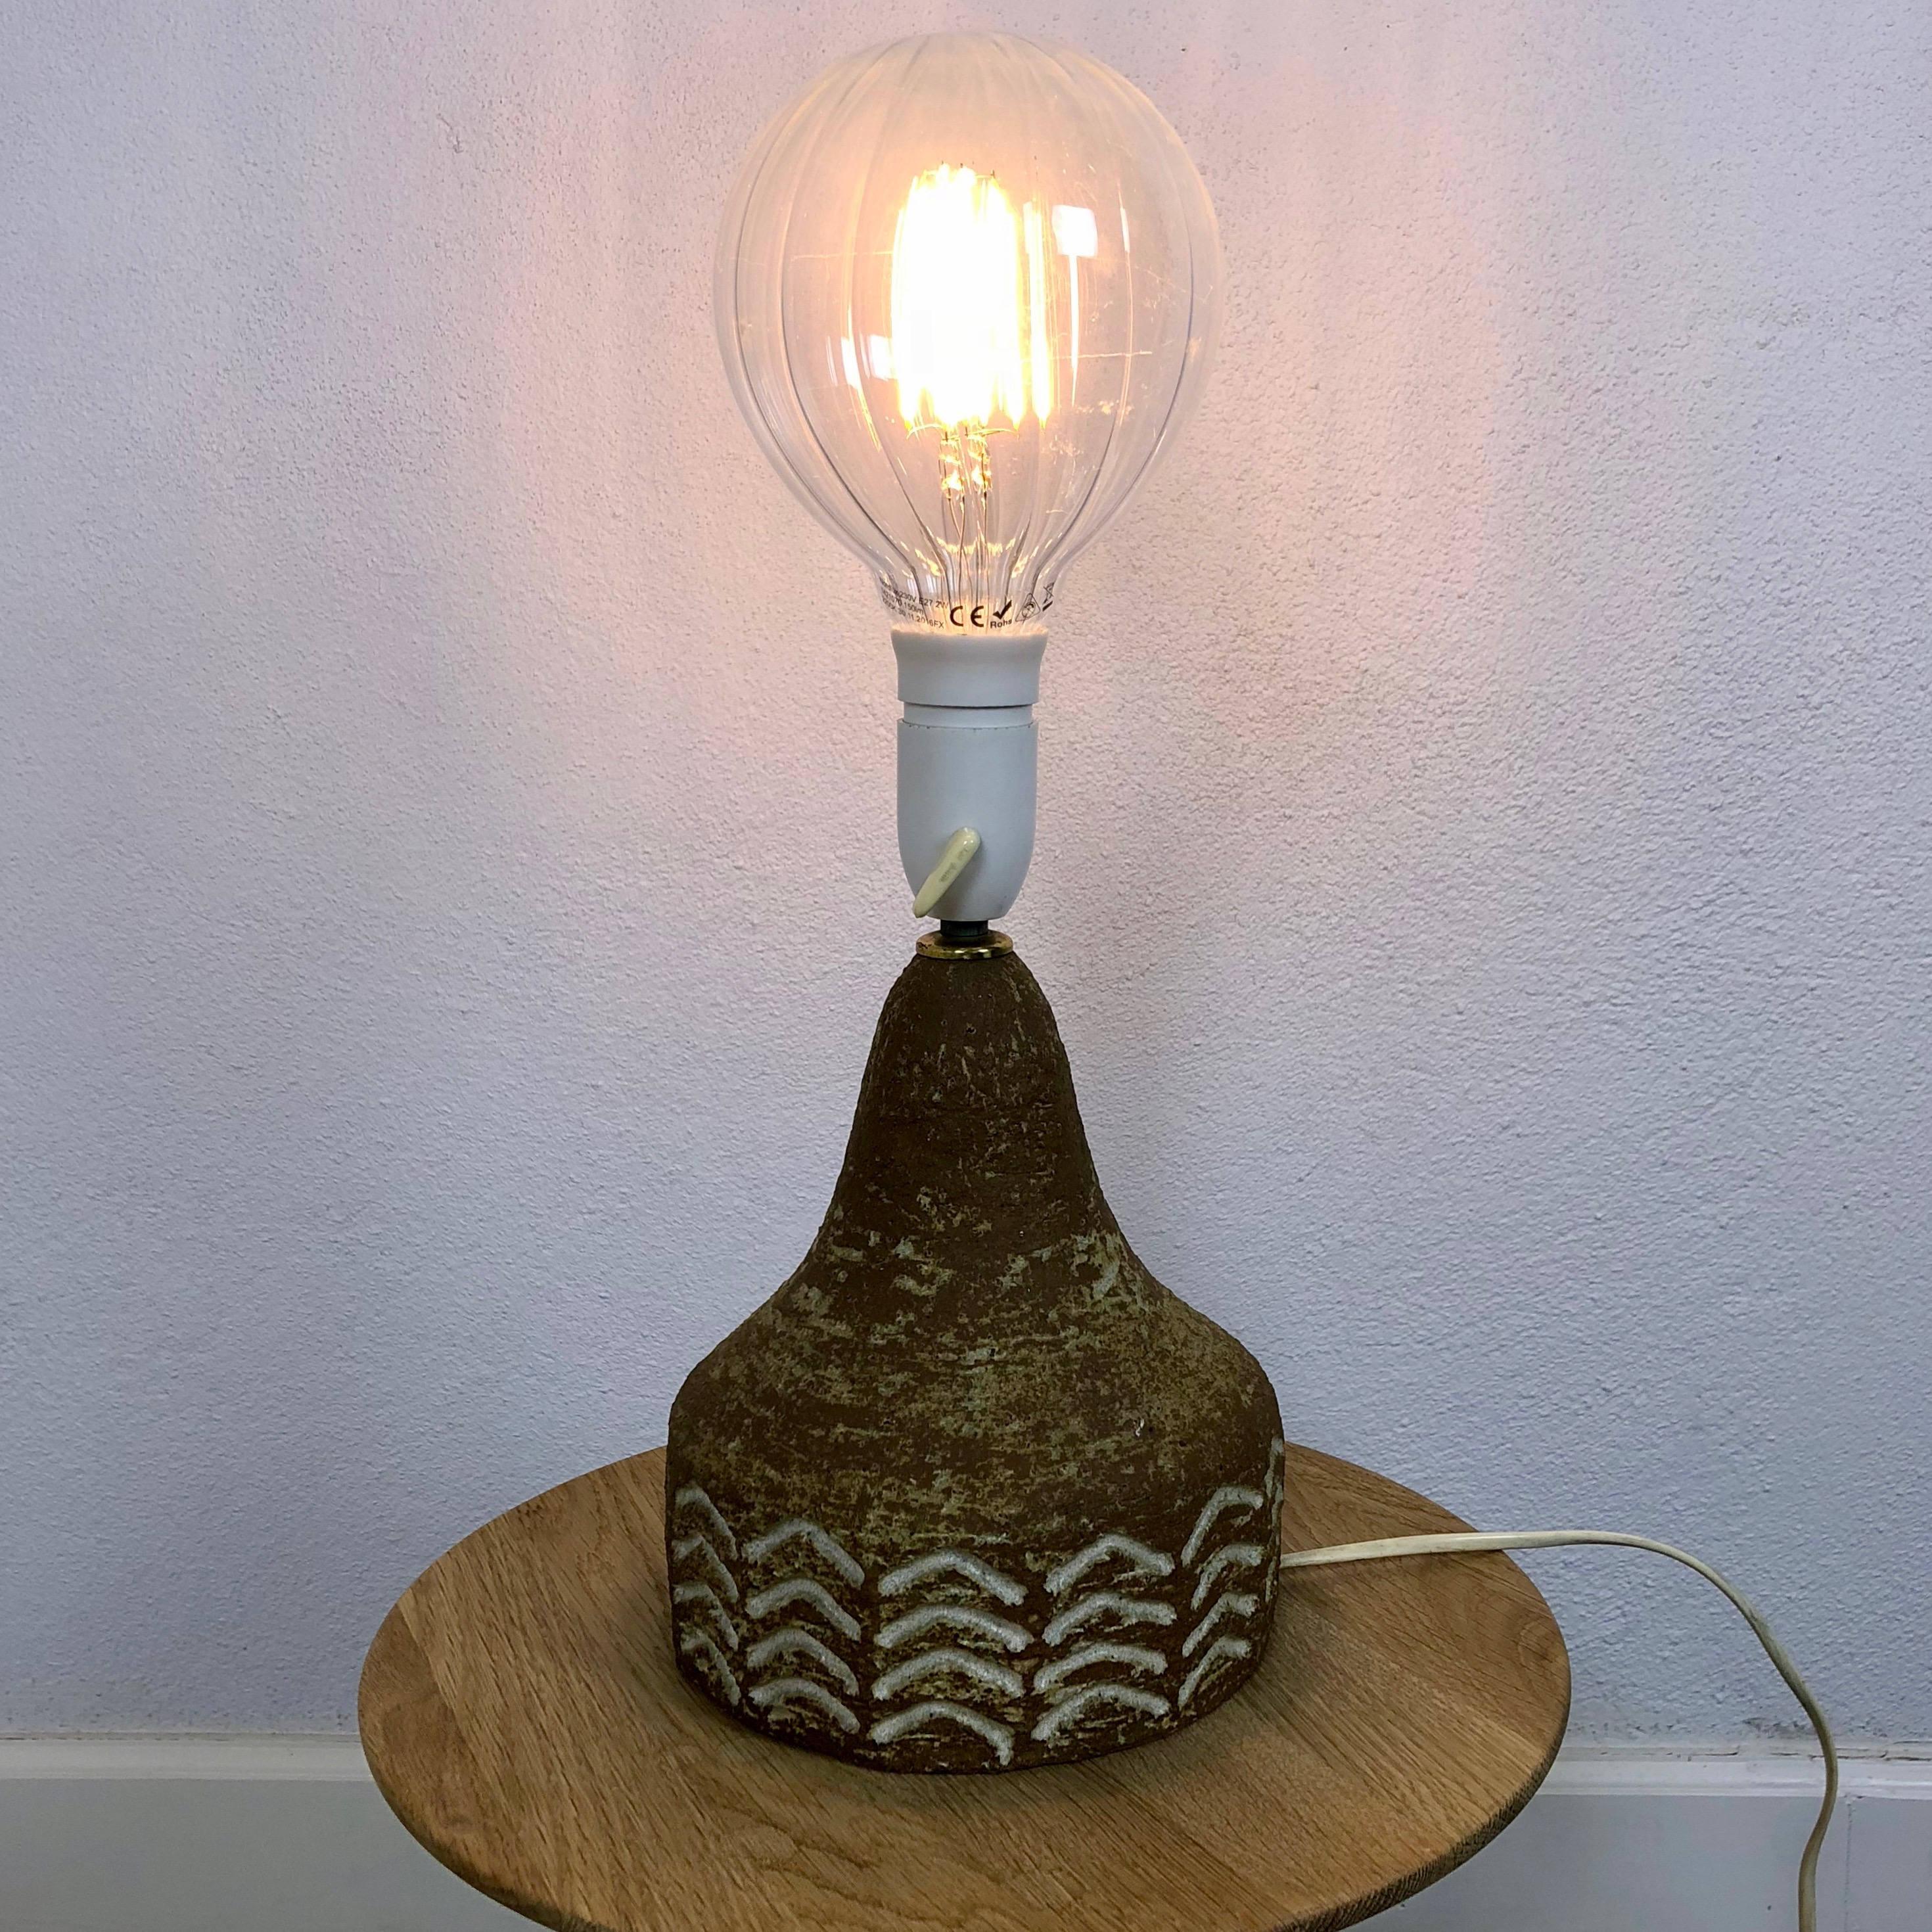 black ceramic lamps deco yellow beautiful table art vintage contemporary lamp crystal genius top